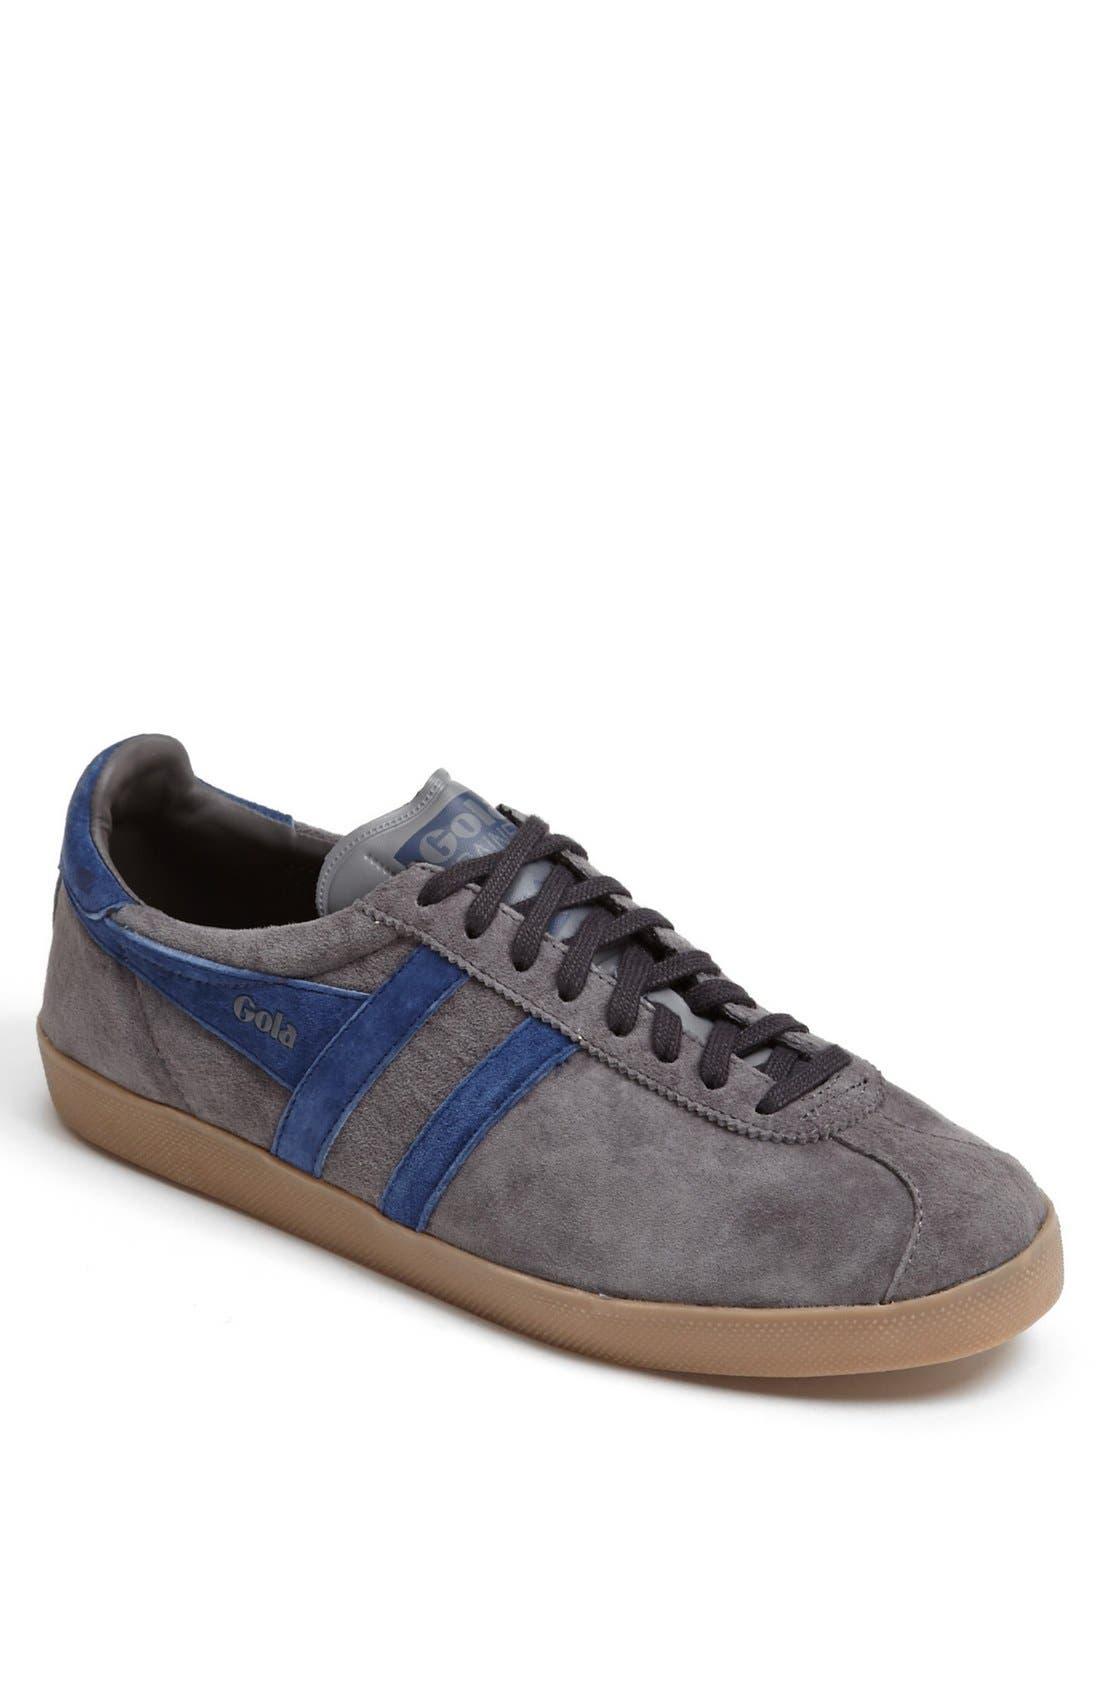 Alternate Image 1 Selected - Gola 'Trainer' Sneaker (Men)